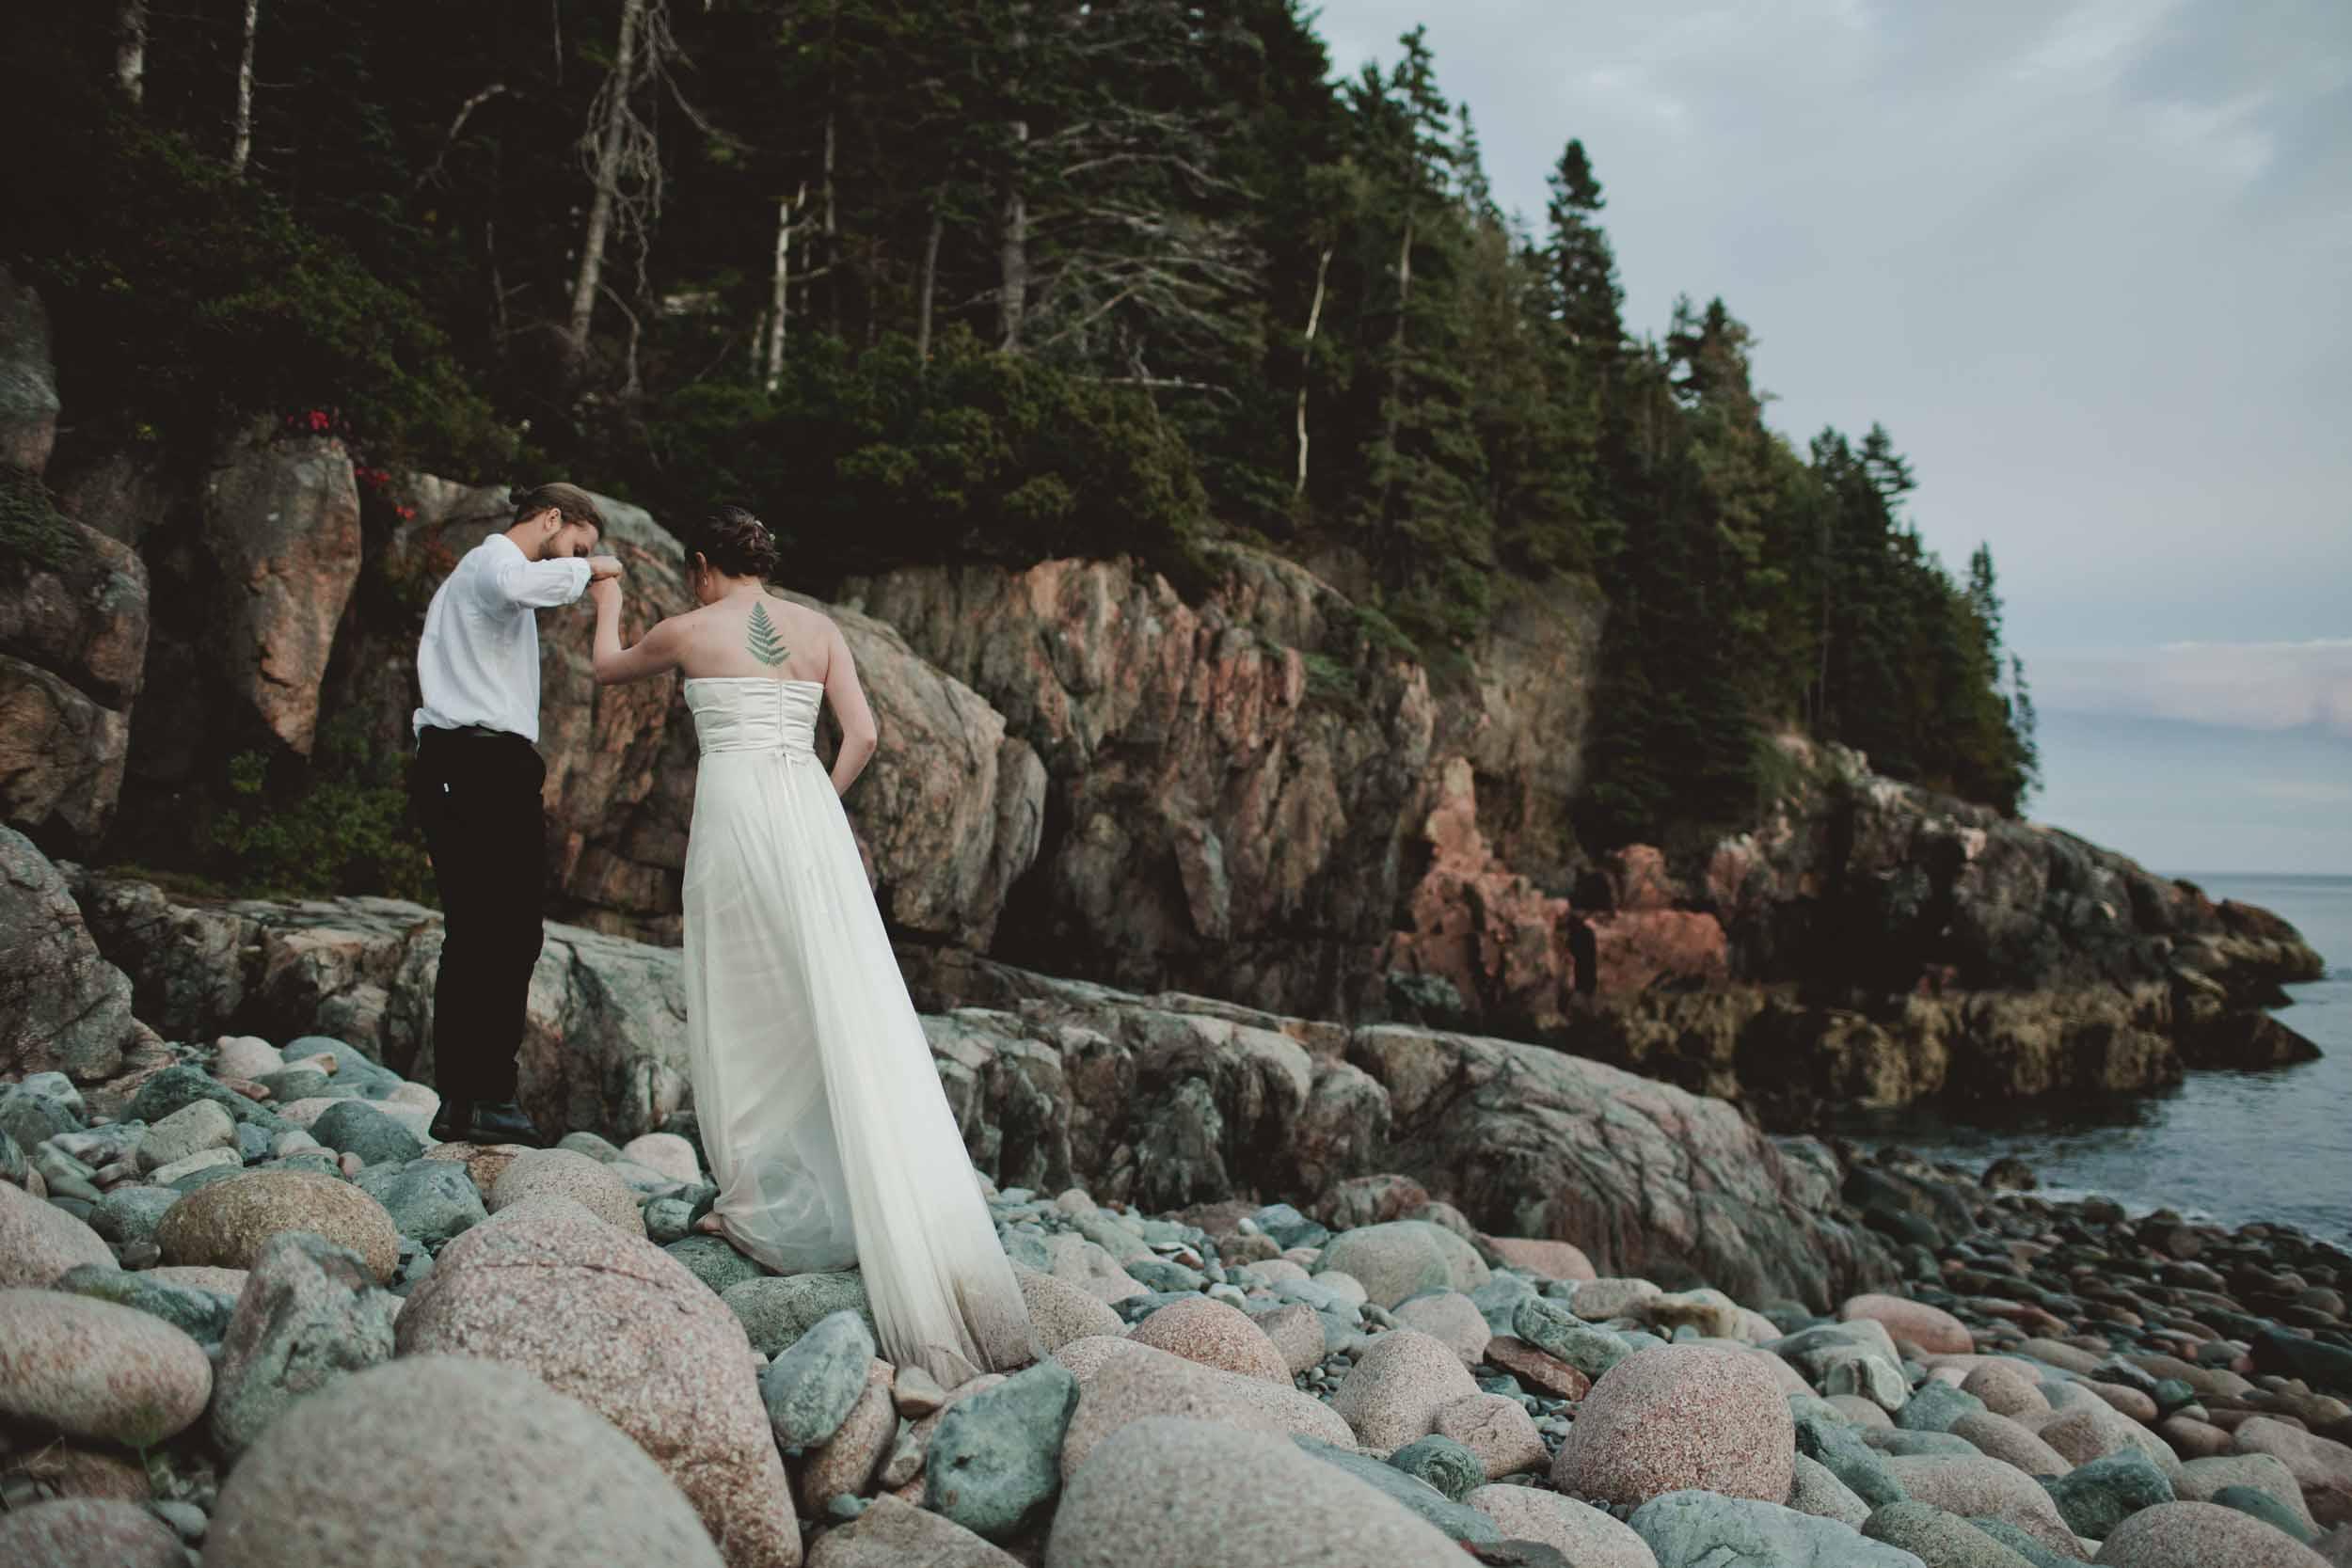 Maine-Elopement-Photographer41.jpg